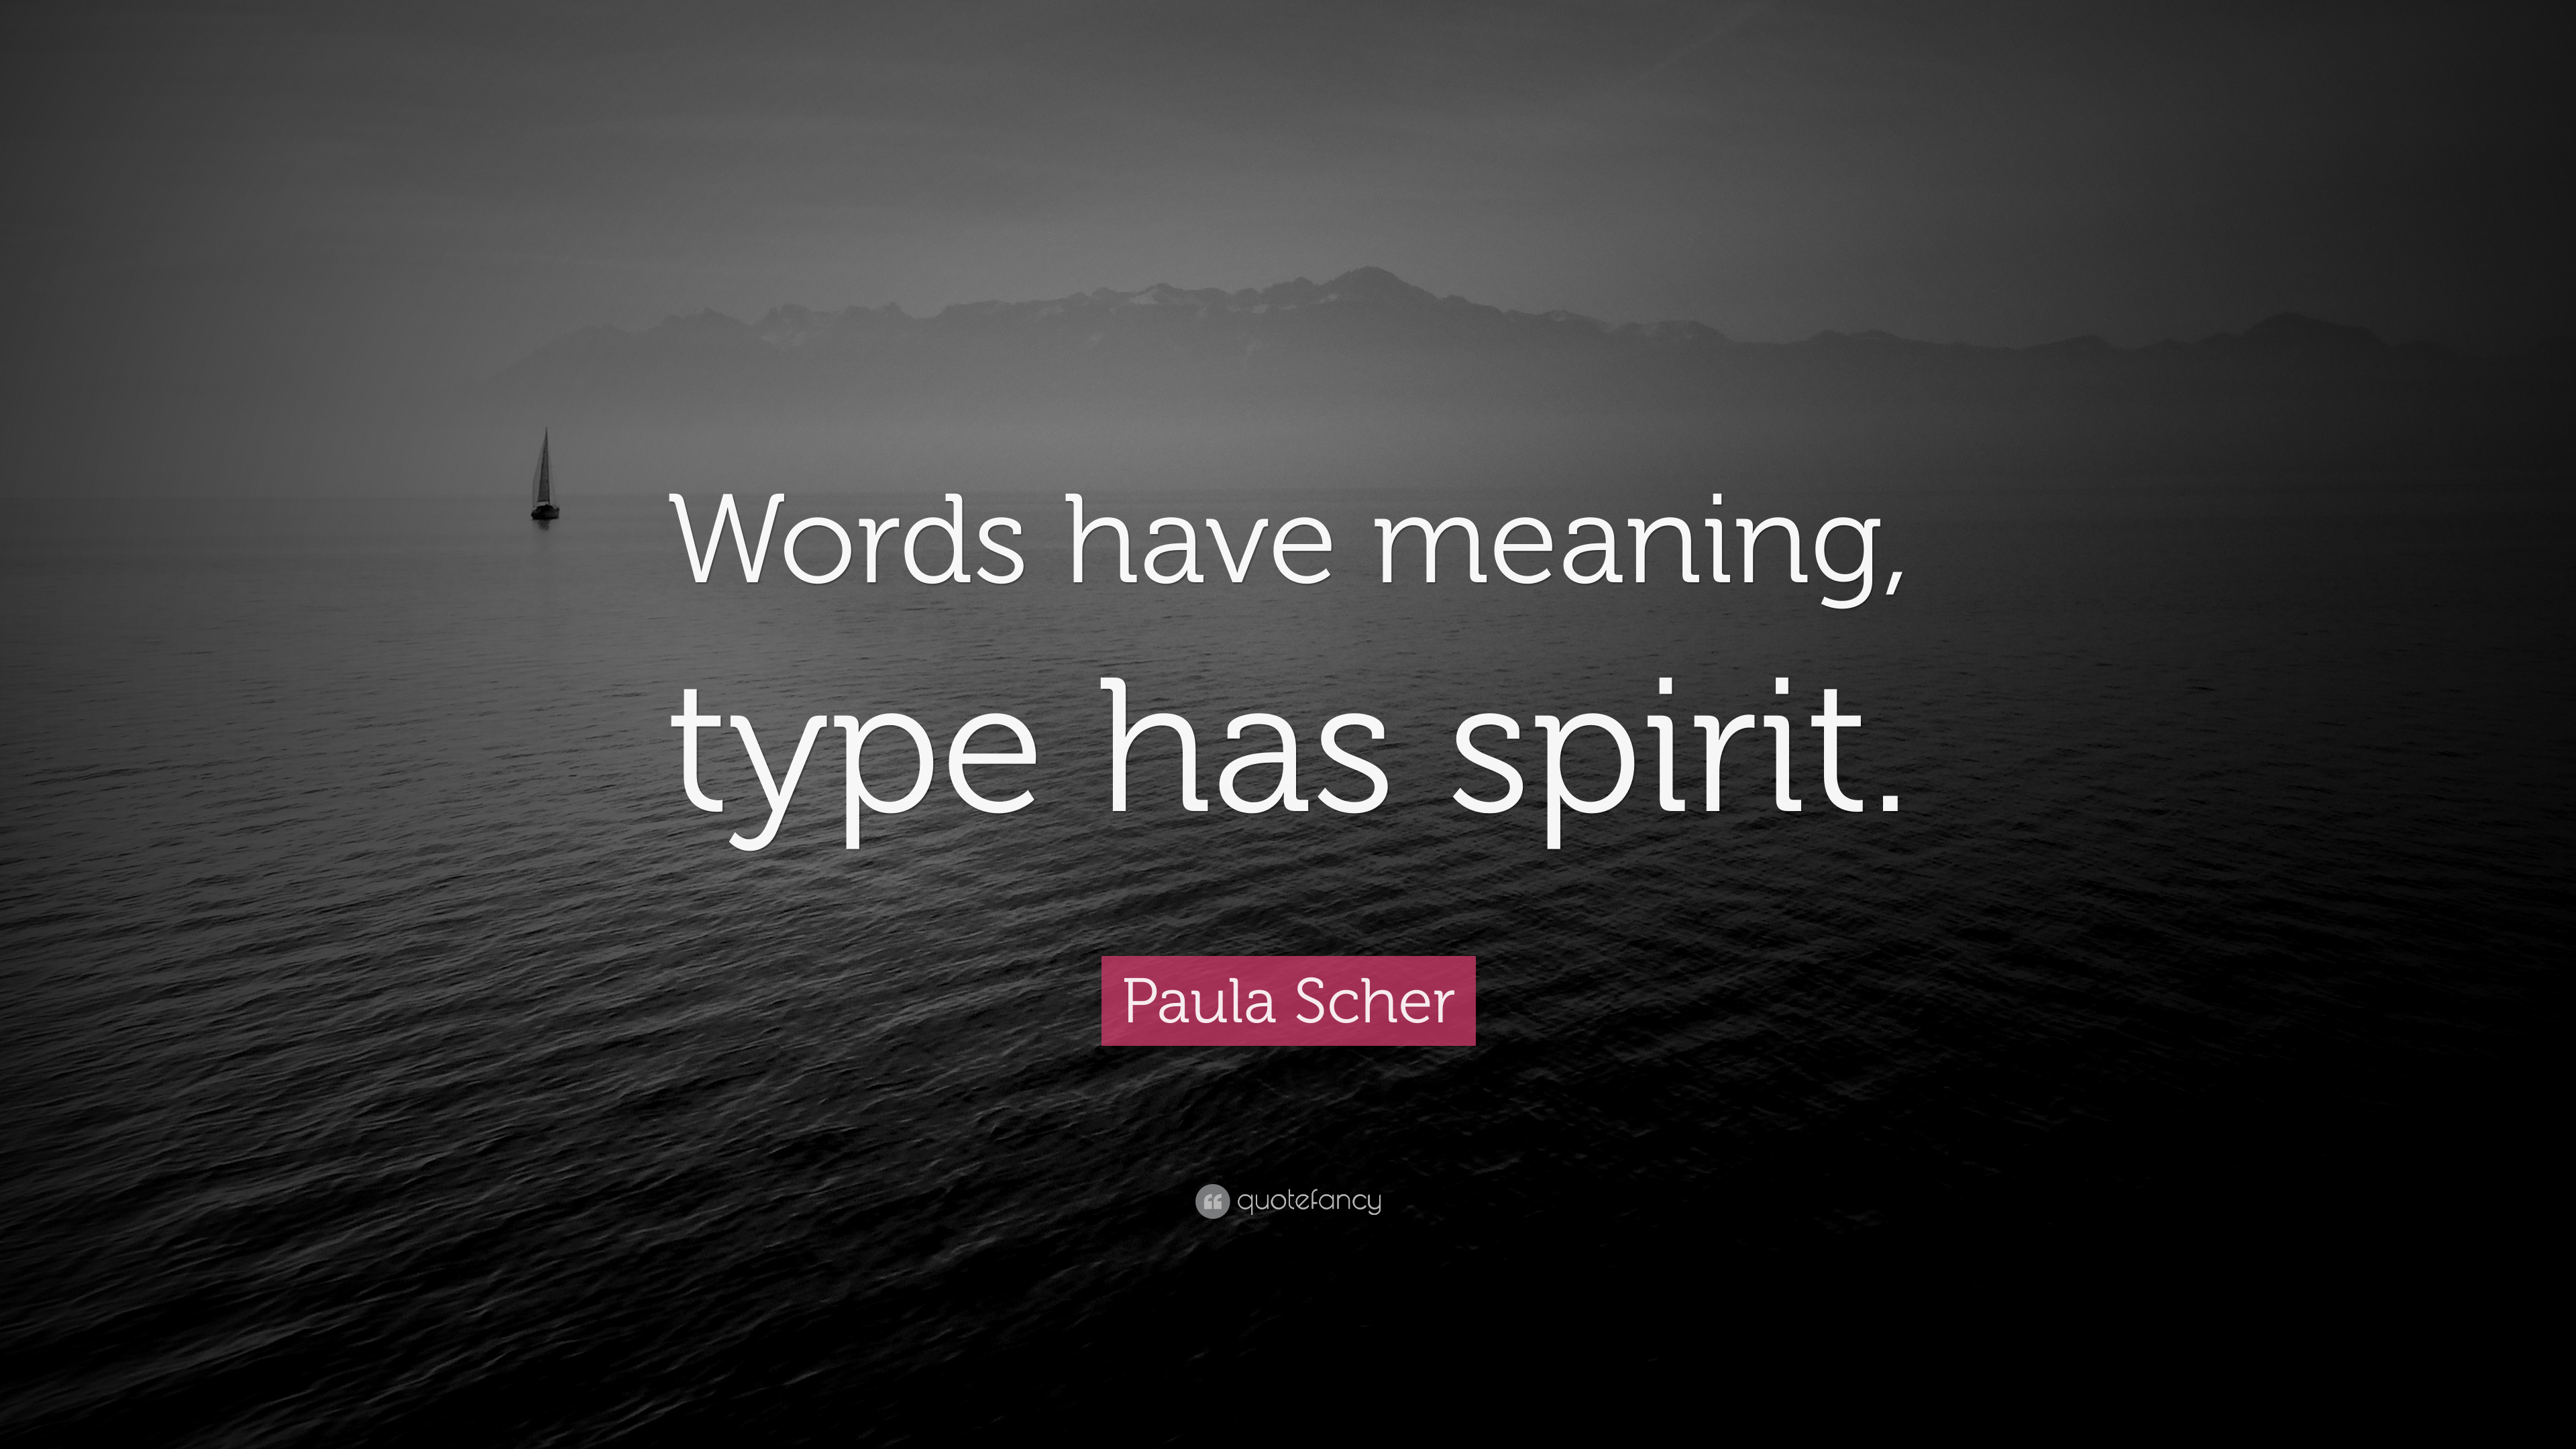 White Spirit Meaning